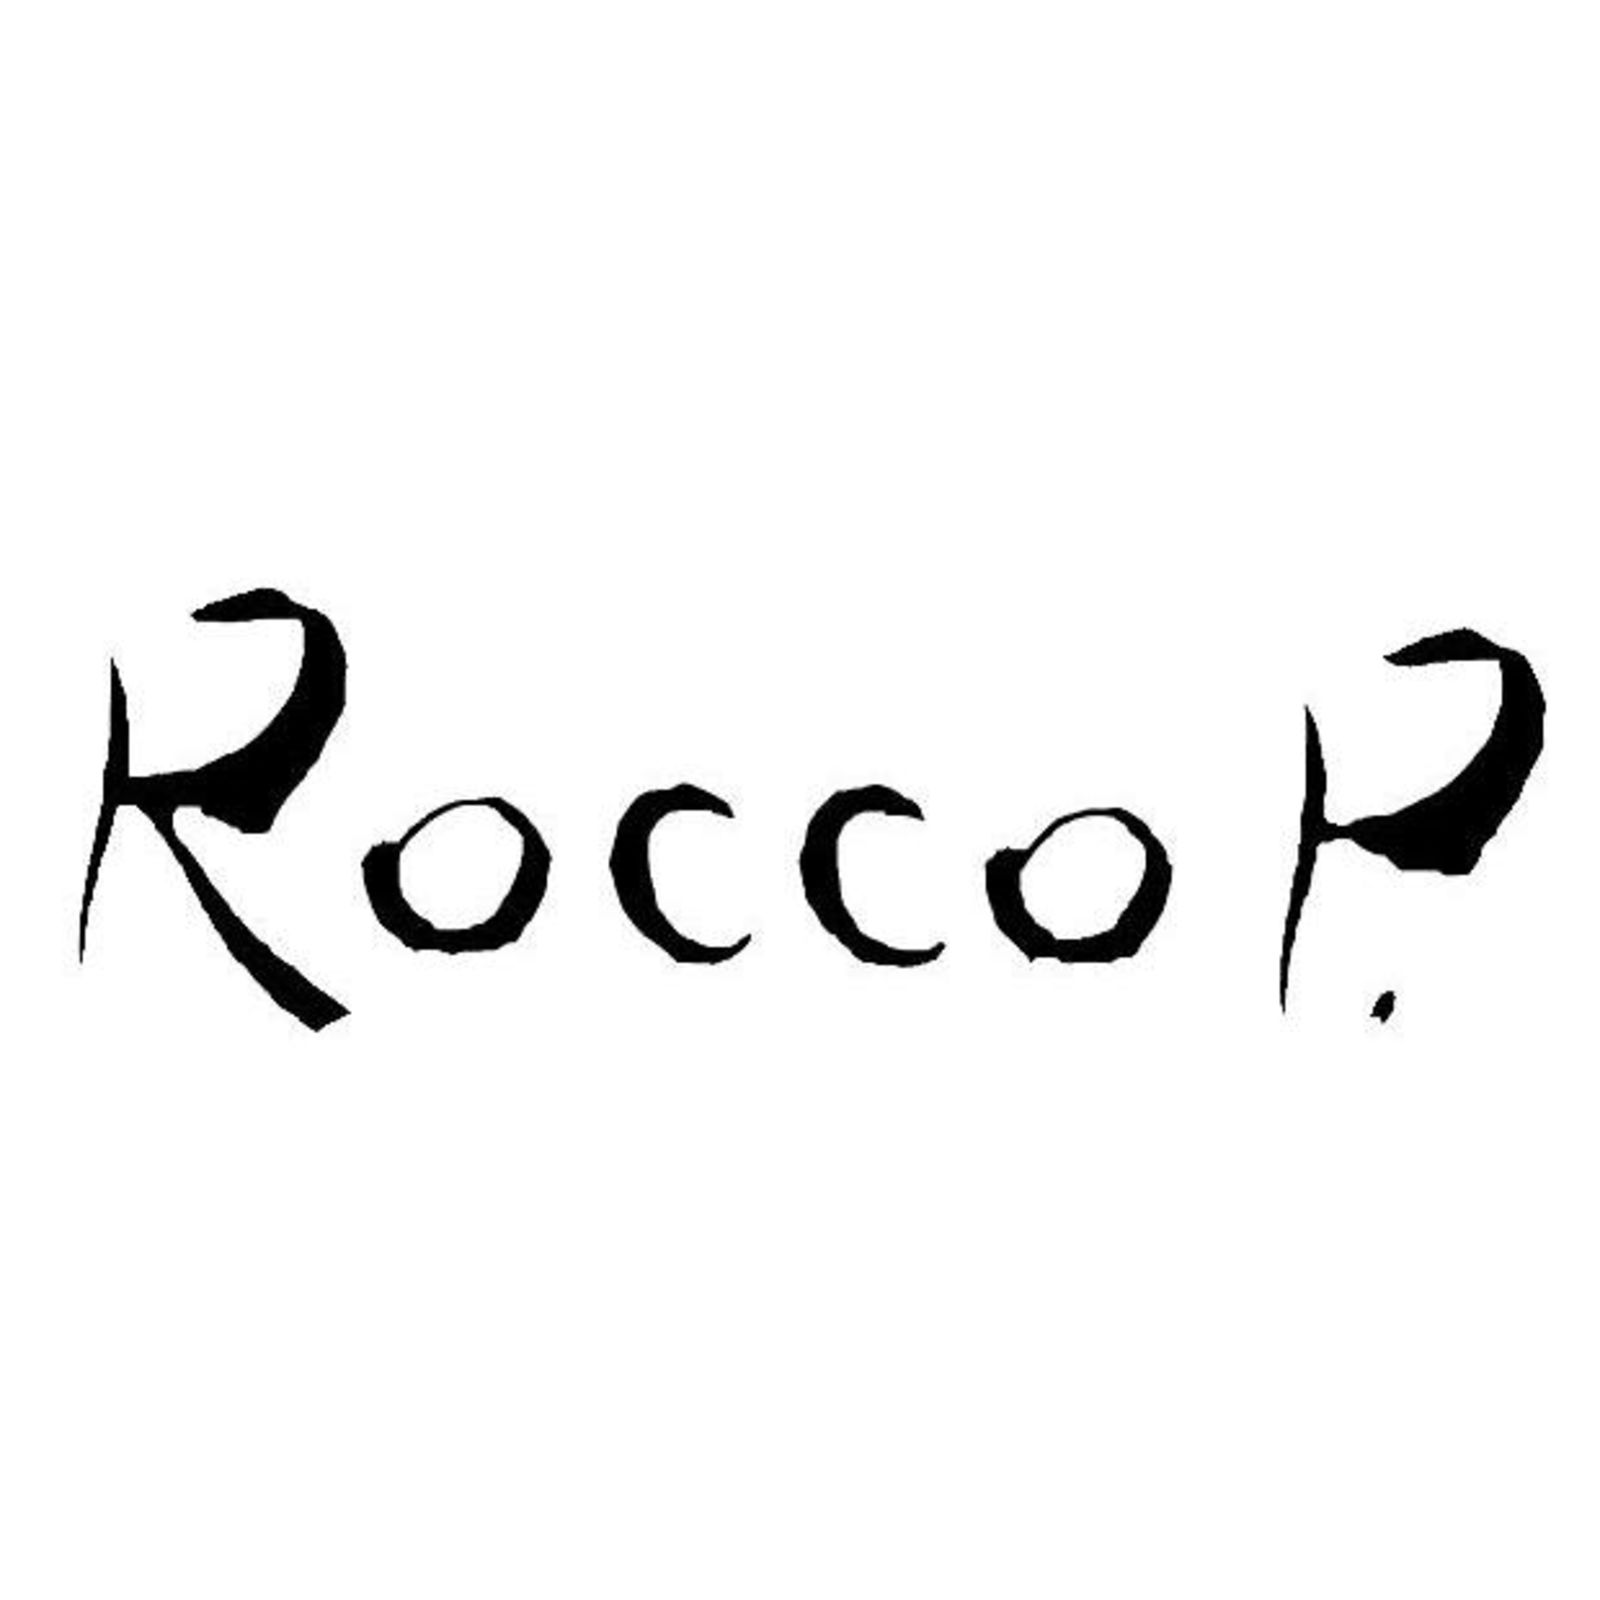 Rocco P (Bild 1)